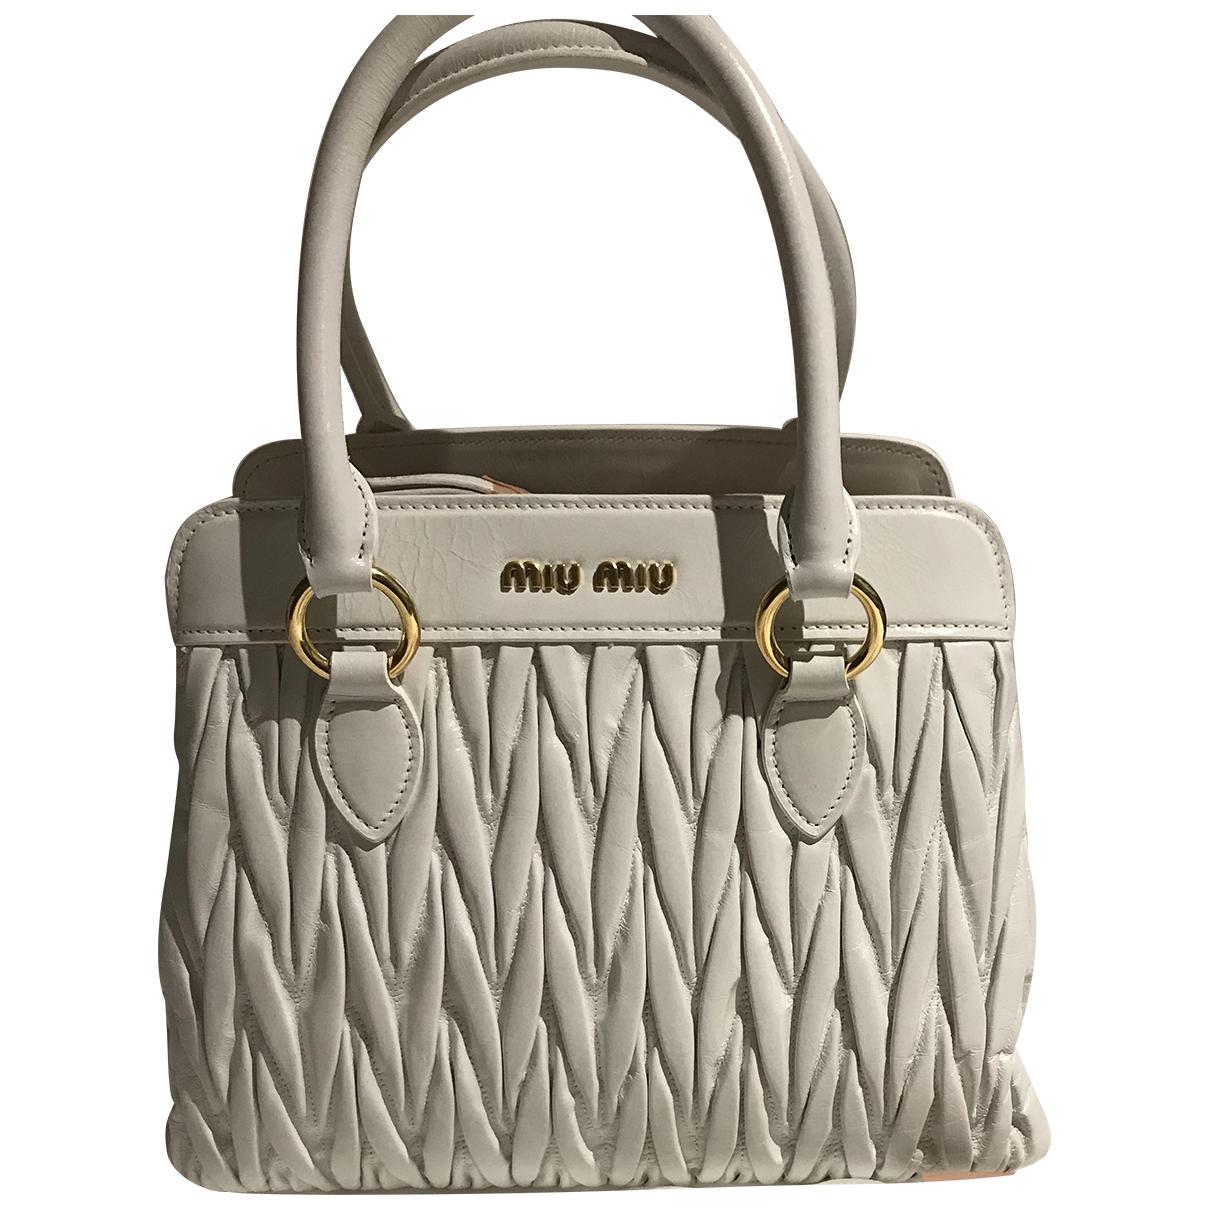 Miu Miu Matelassé White Leather handbag for Women \N